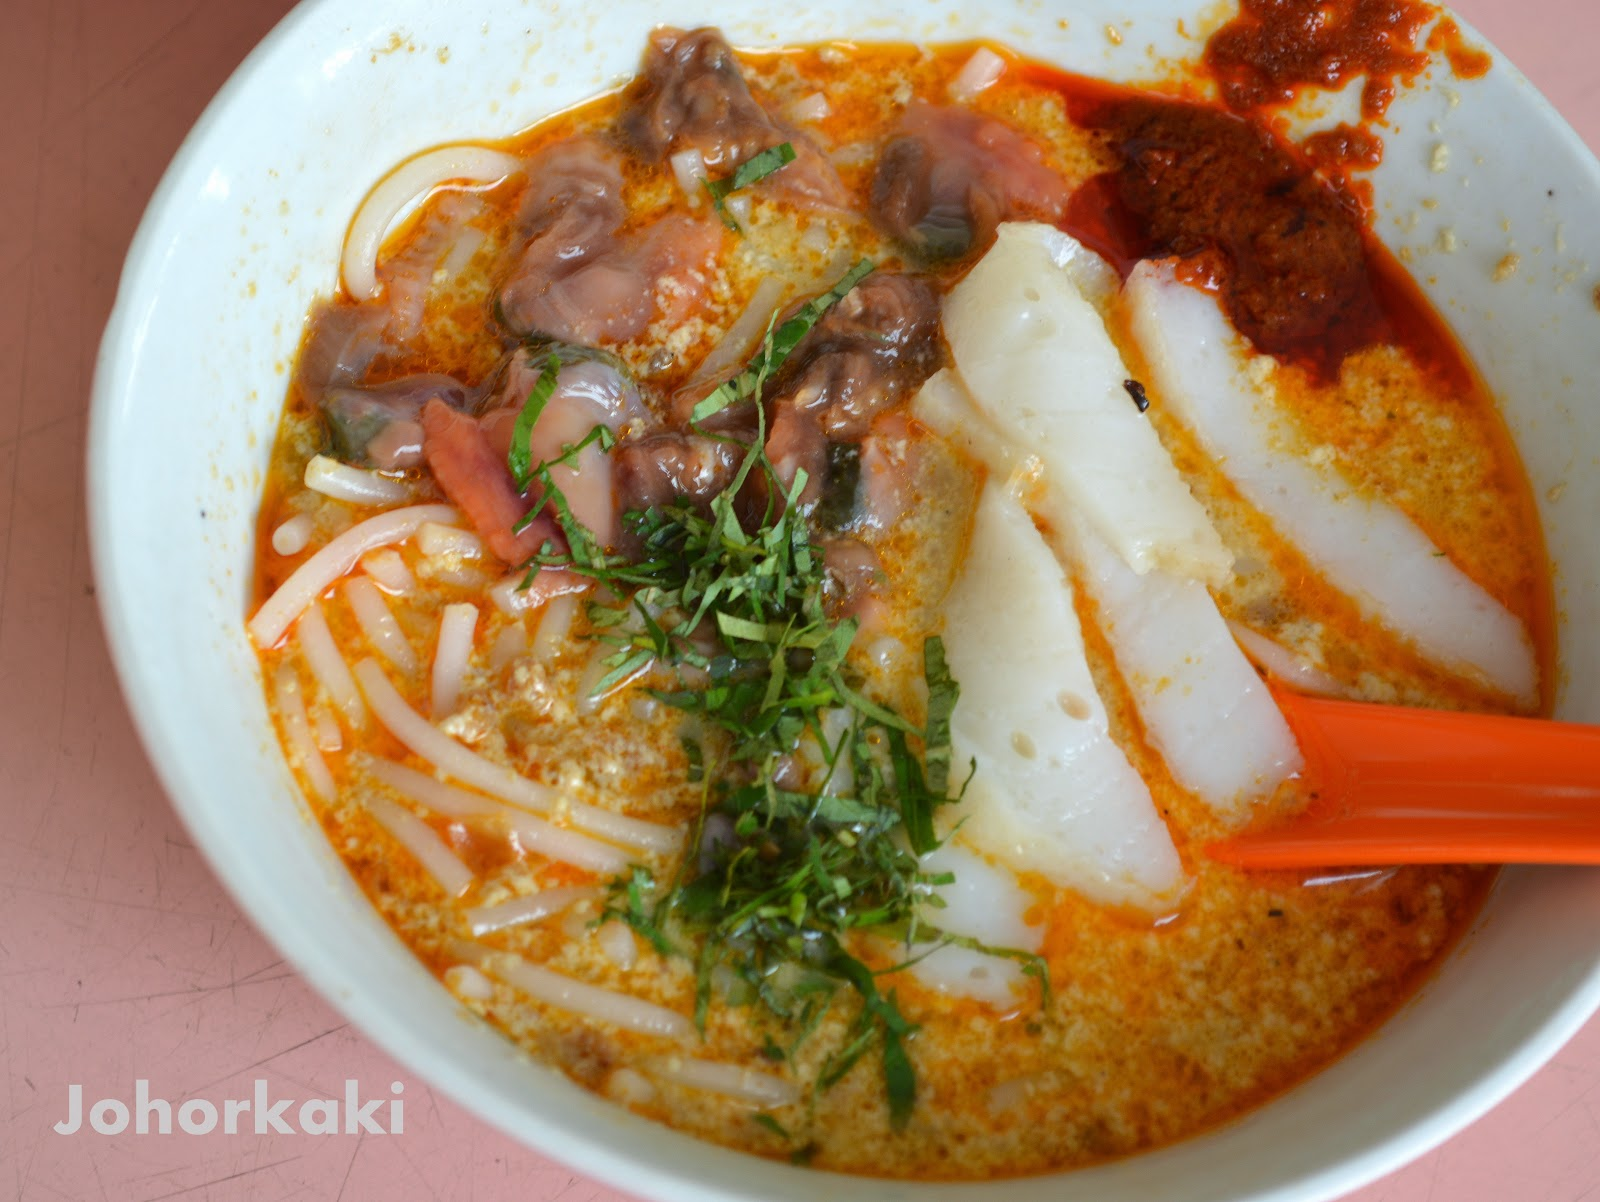 Sungei road laksa singapore johor kaki food travel for Cuisine kaki